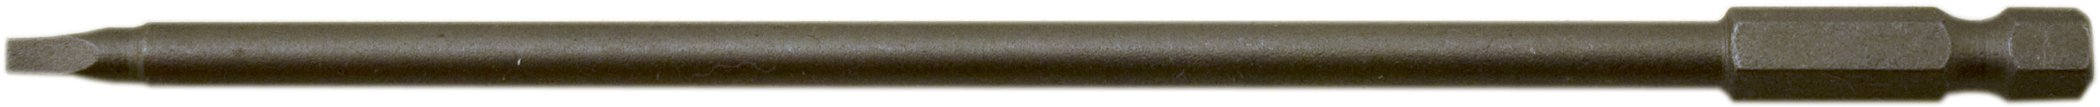 Enkay 3125-2C 6-Inch Number 1 Phillips Bit Cardado 2-Pz.